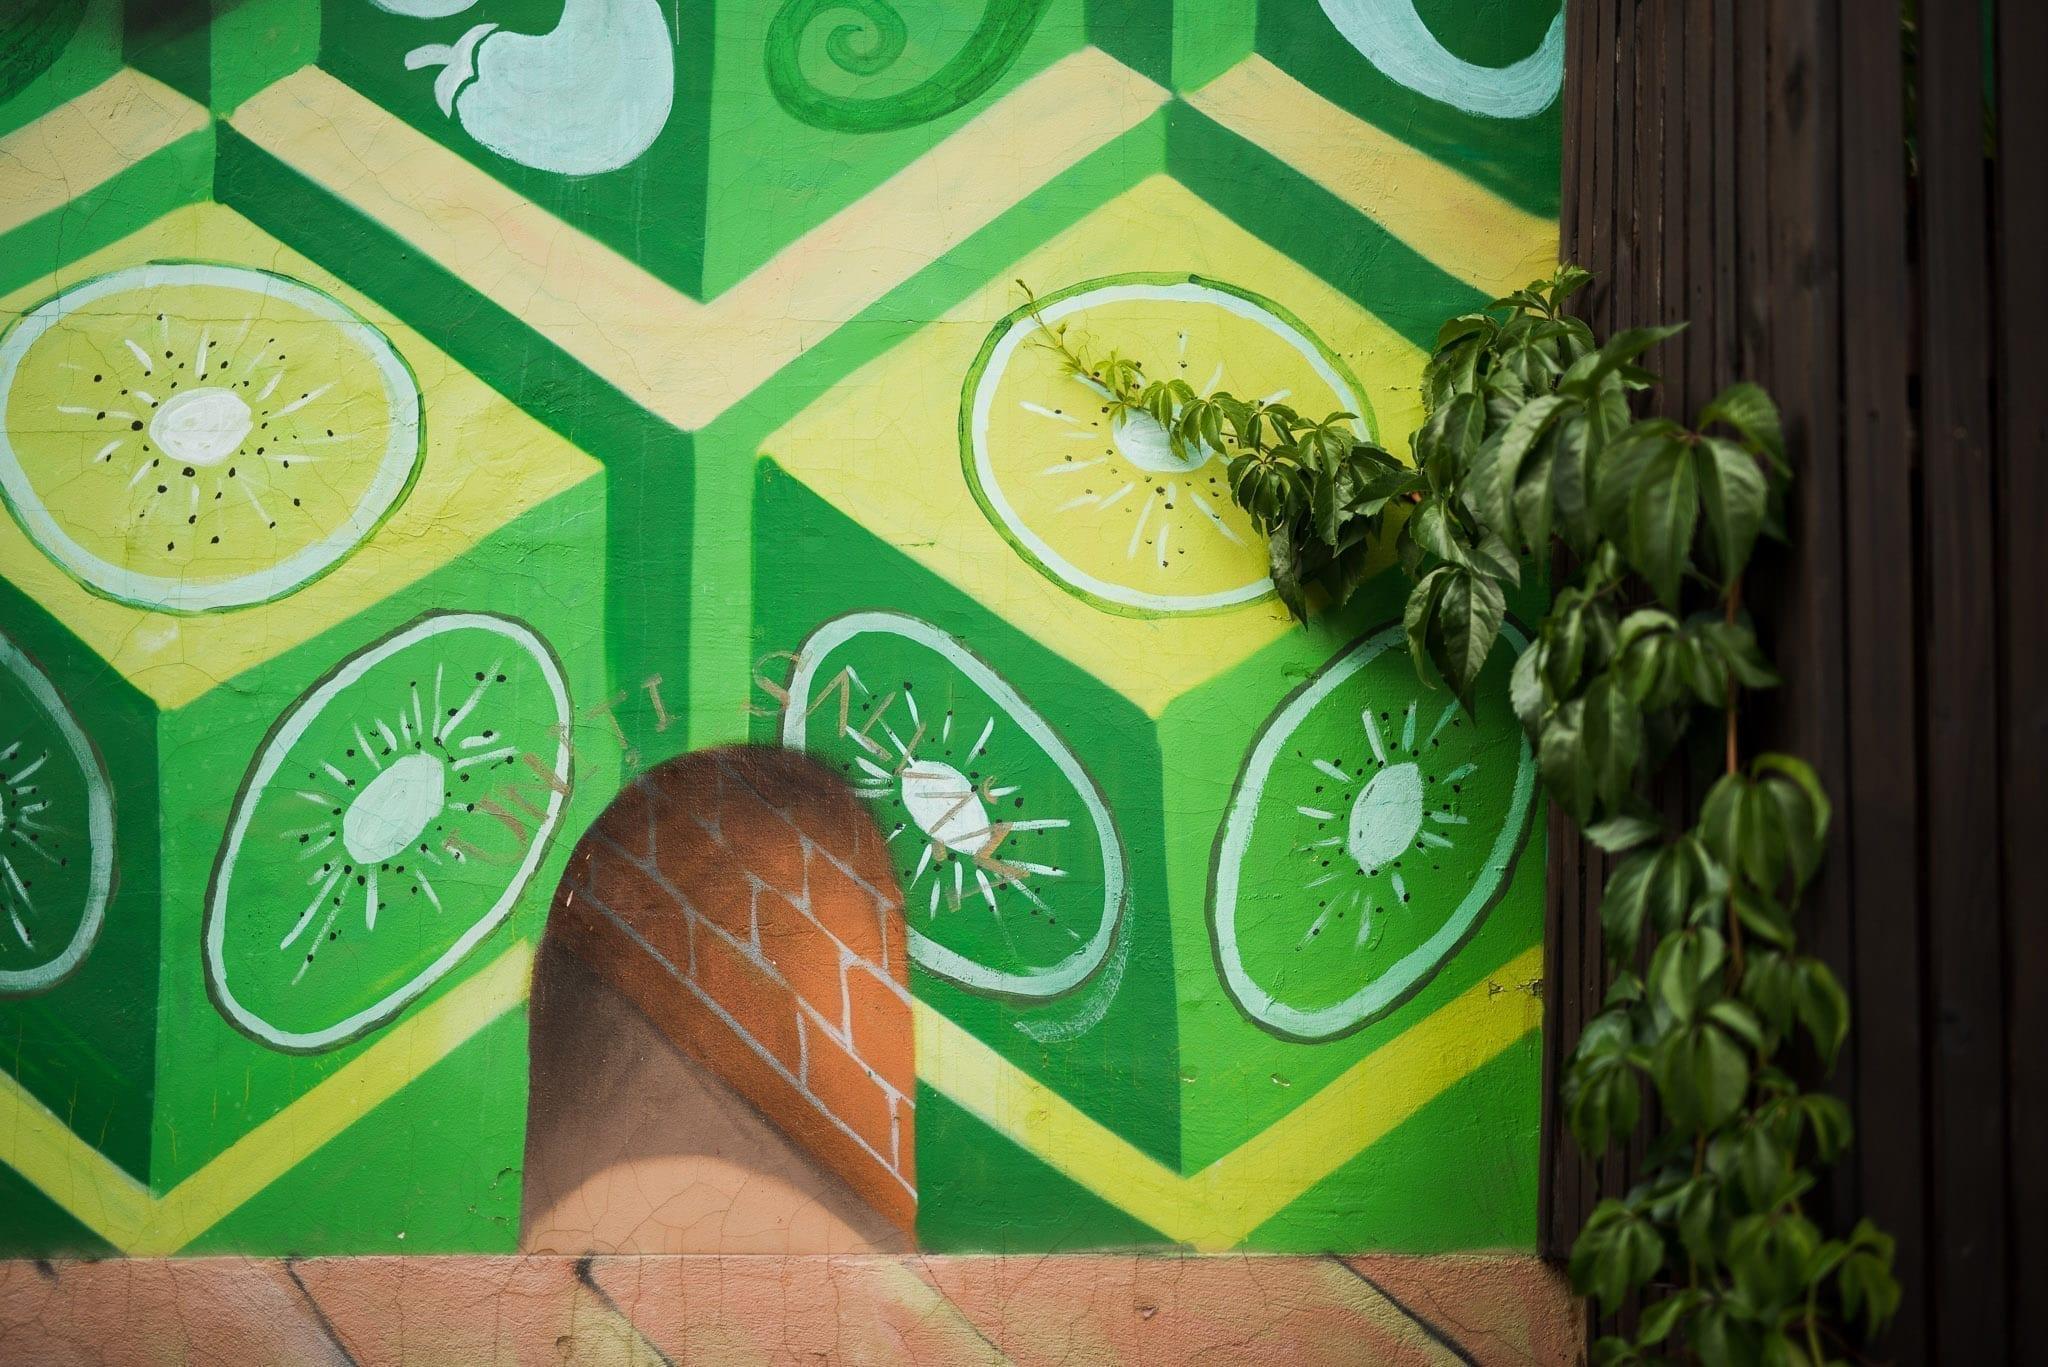 Kero & Ocu Samsara Foodhouse Cluj Un-hidden Street Art in Romania book photo © Anita Jimbor, Un-hidden Romania